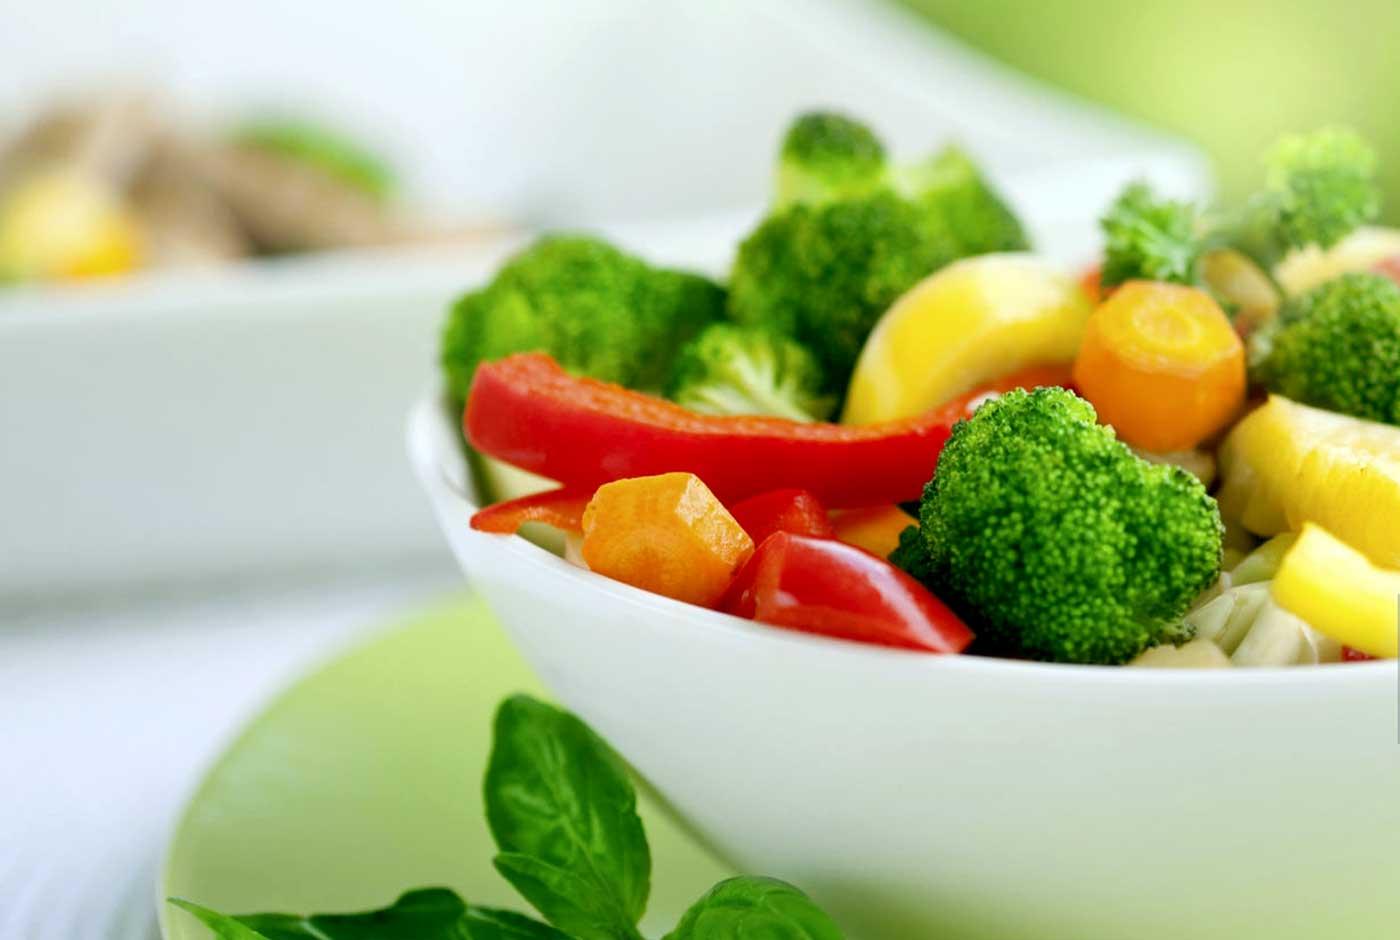 Thai stir fried vegetables